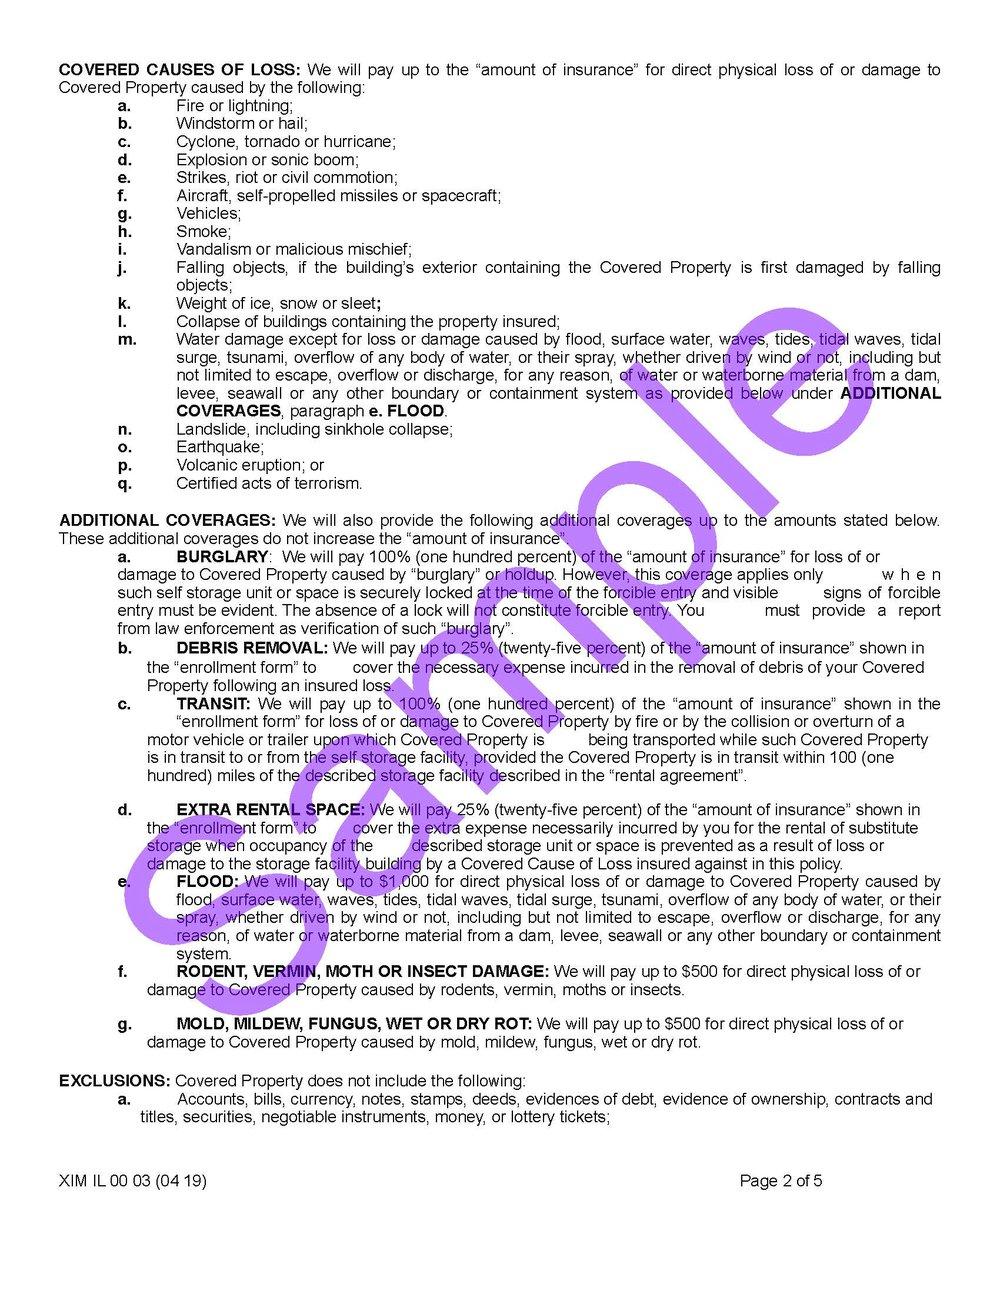 XIM IL 00 03 04 19 Illinois Certificate of InsuranceSample_Page_2.jpg